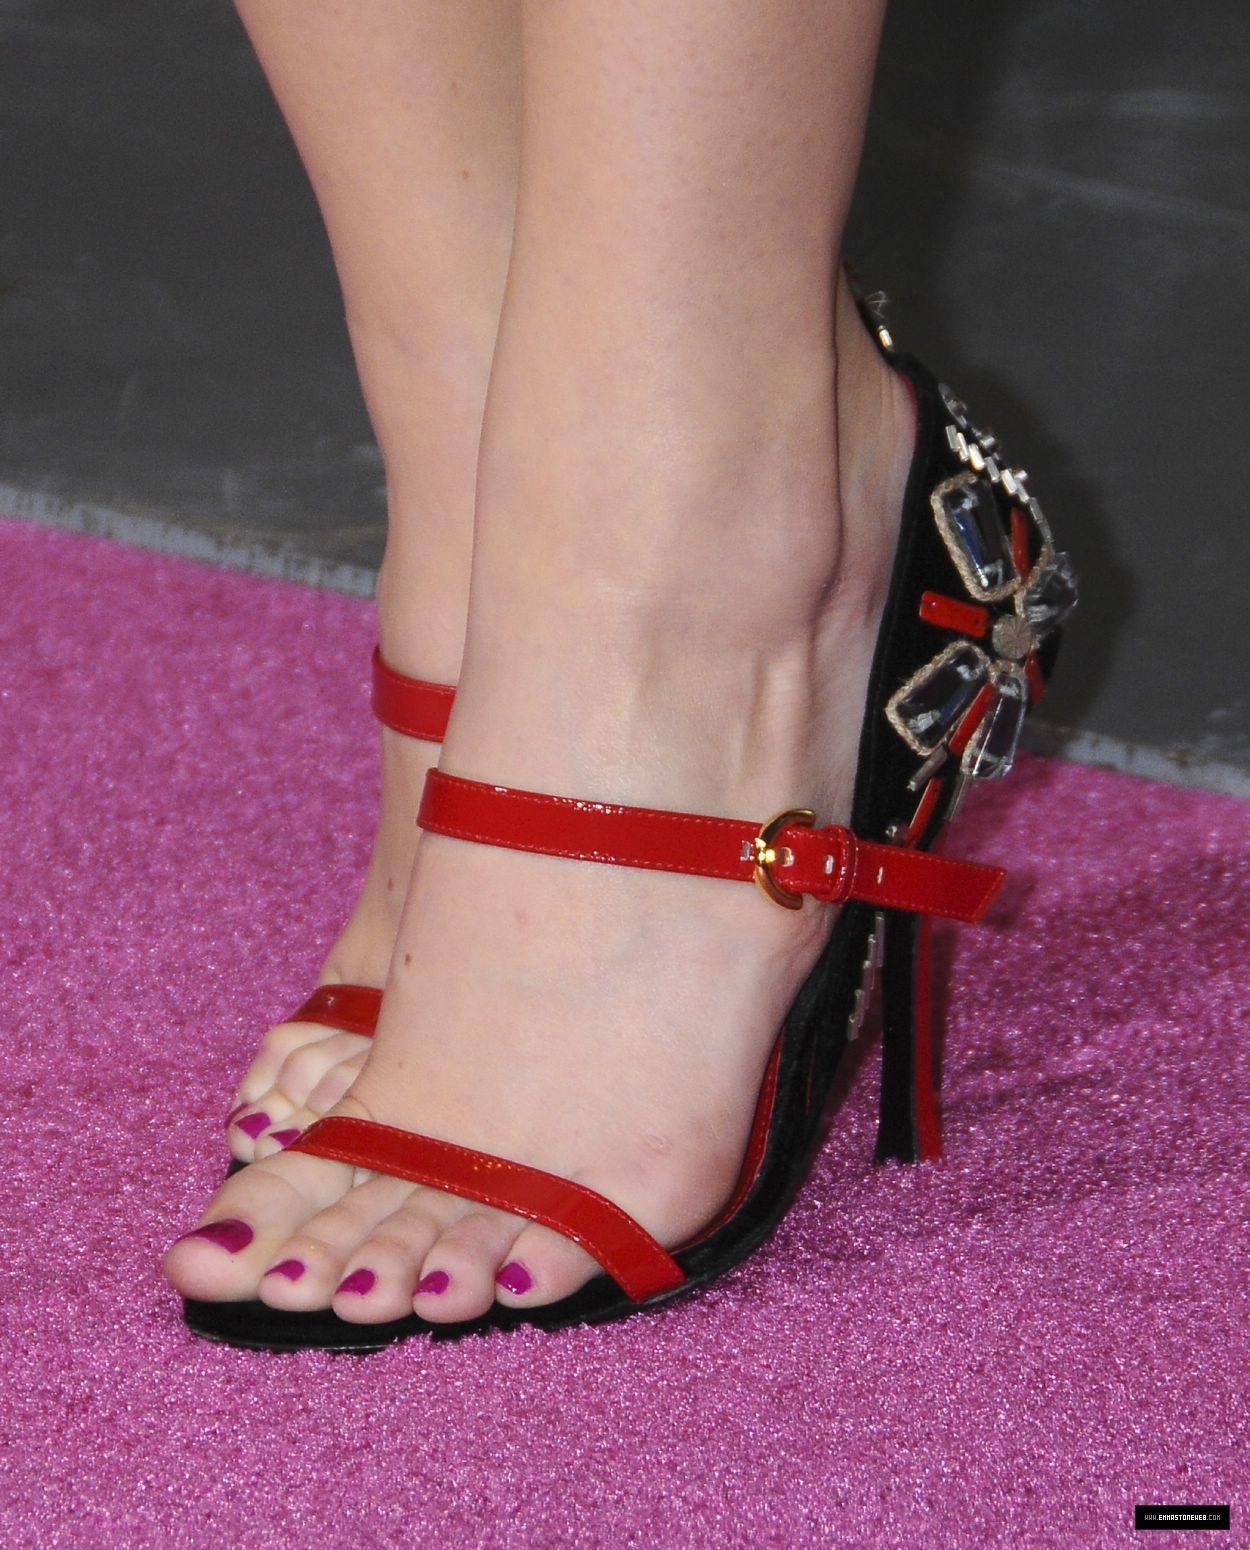 Emma Stone Pantyhose Feet - Open Heels